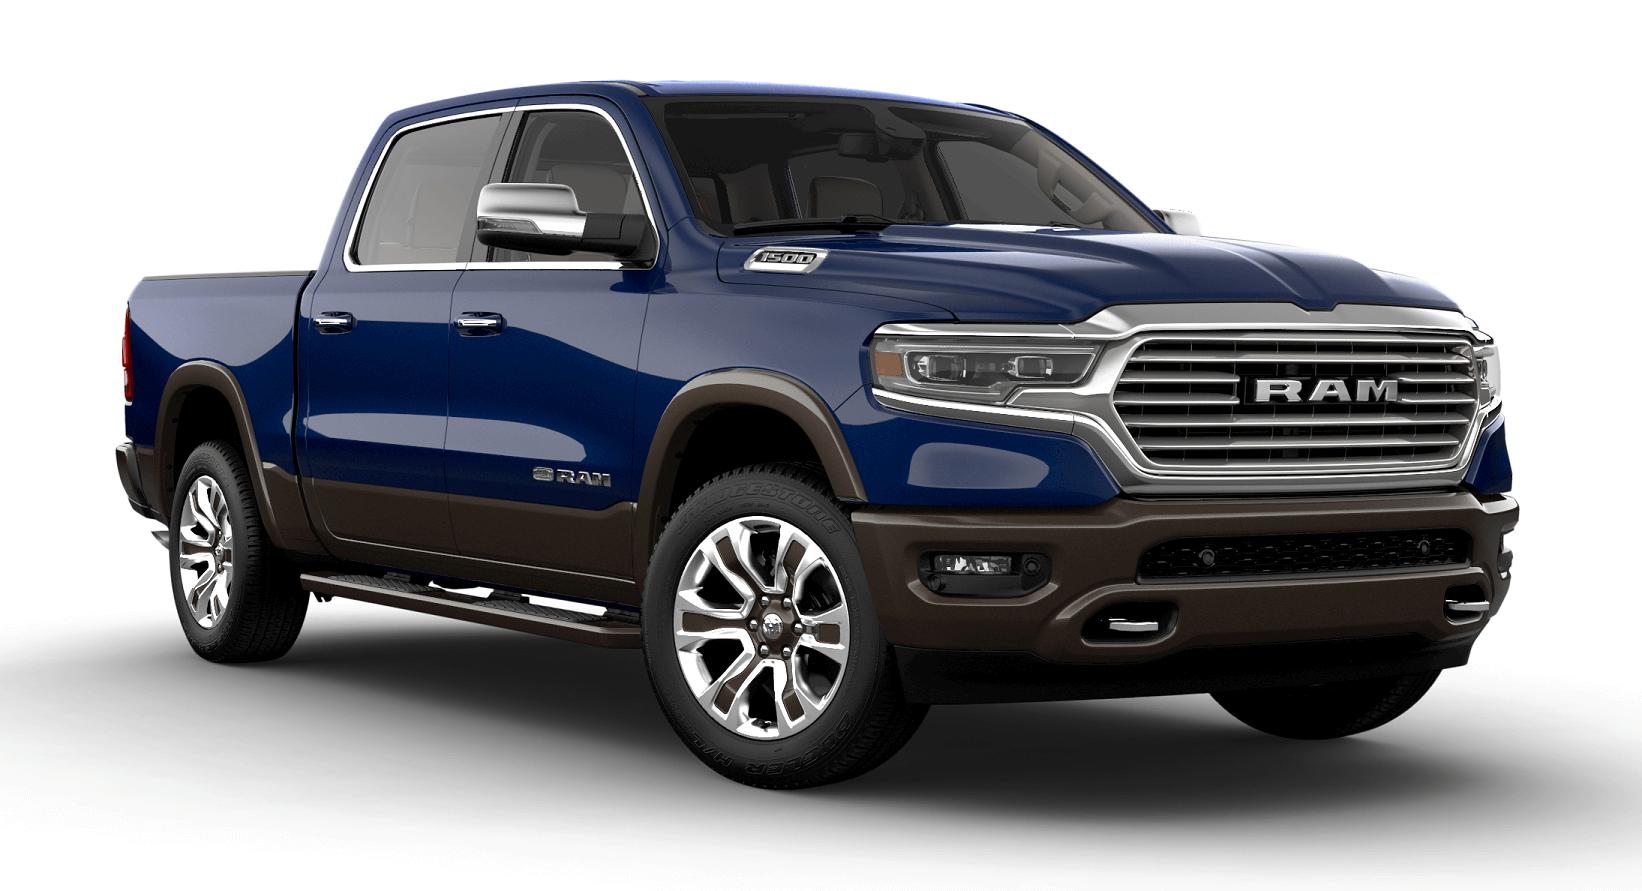 2019 RAM 1500 LARAMIE LONGHORN CREW CAB BOX Patriot Blue Pearl Coat